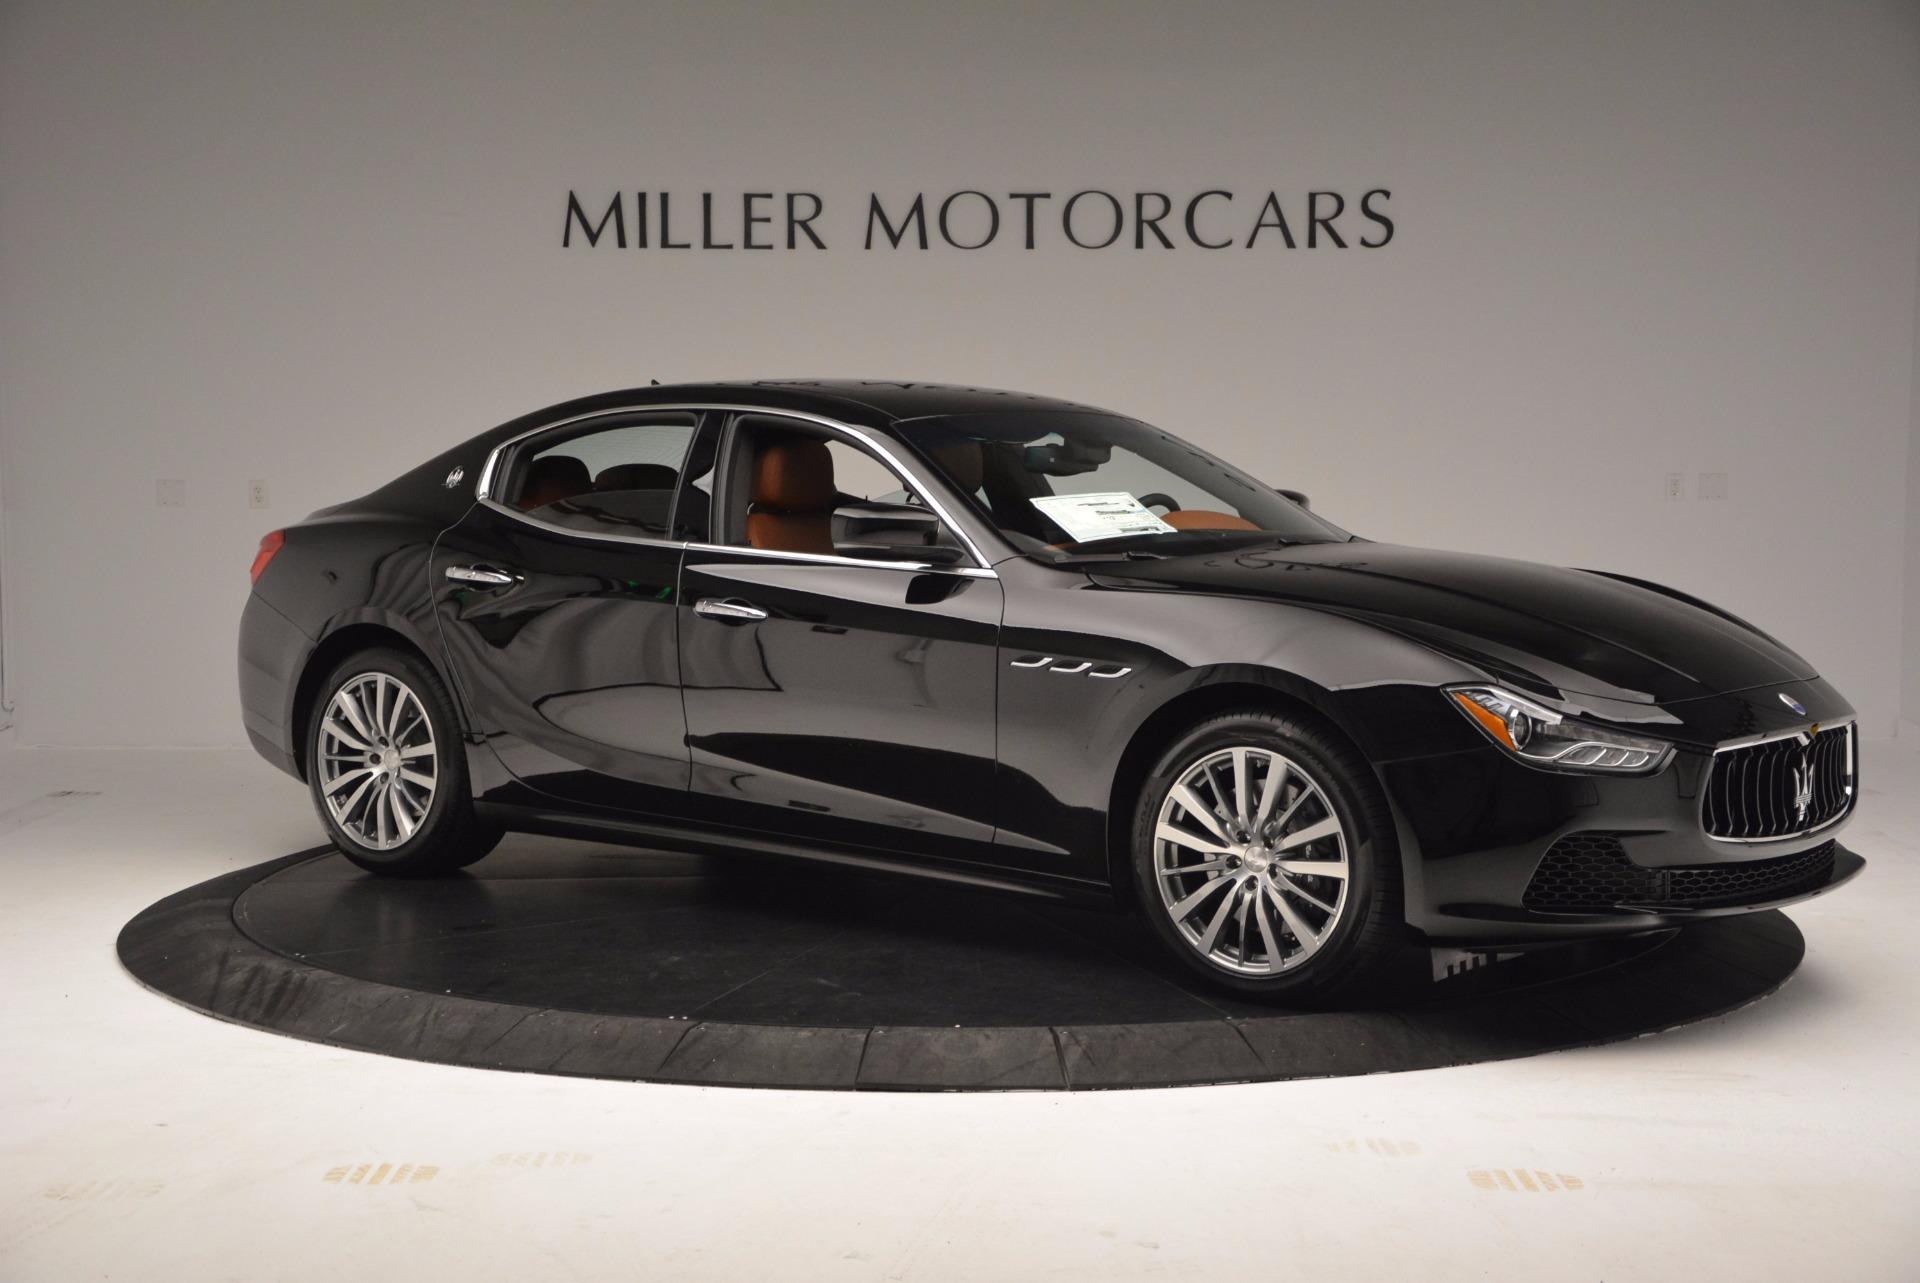 New 2017 Maserati Ghibli S Q4 EX-LOANER For Sale In Westport, CT 1115_p10